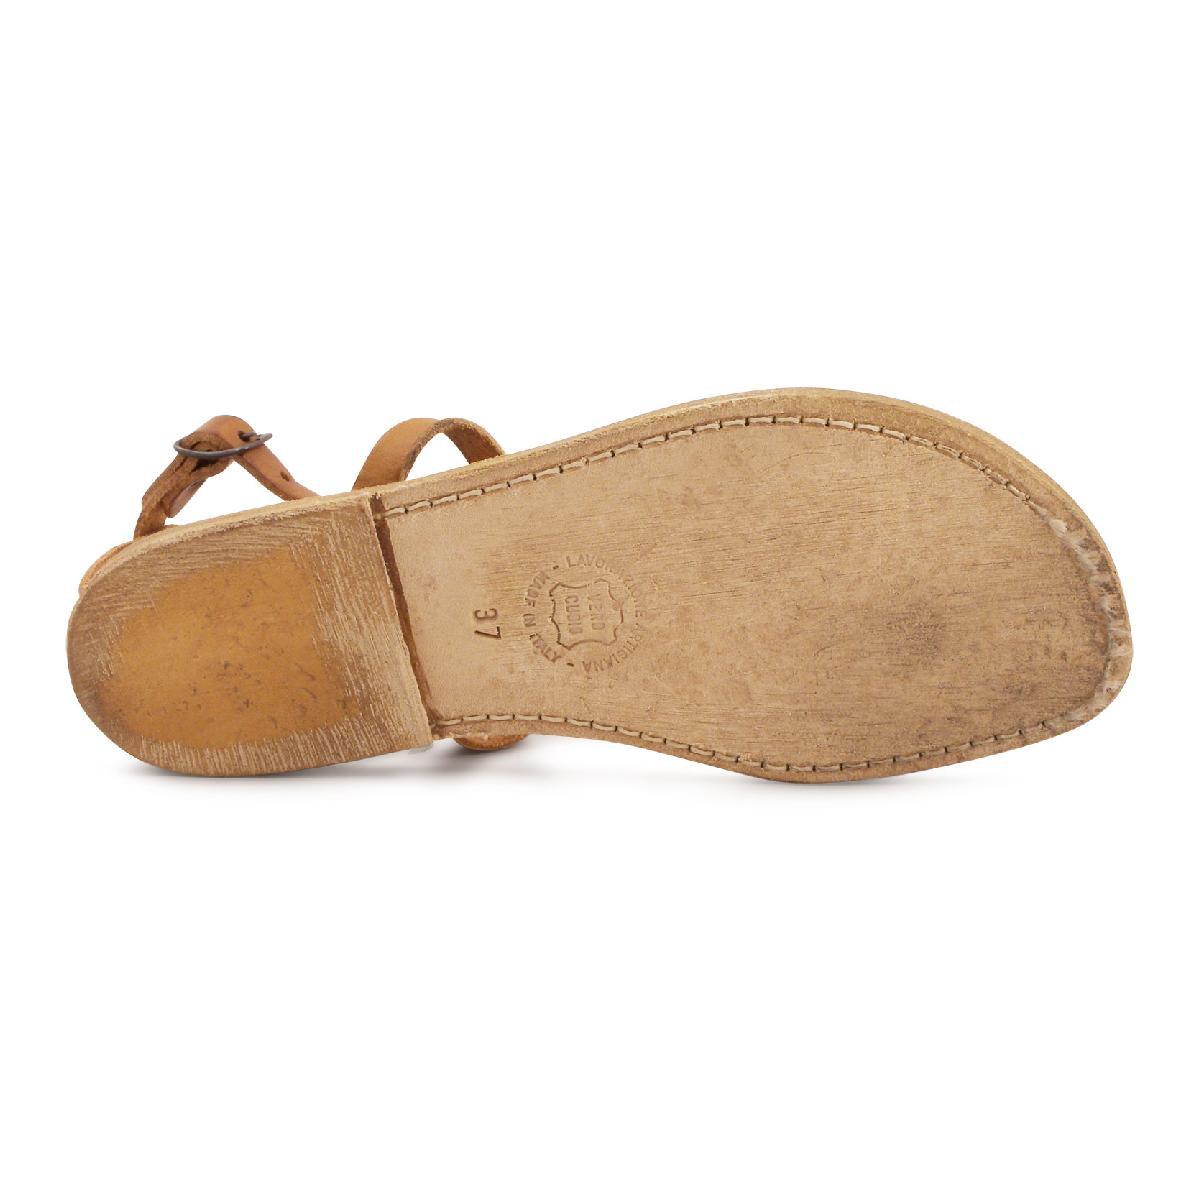 Sesto Meucci Gryta Woven Calf Leather Flat Sandal Details Sesto Meucci